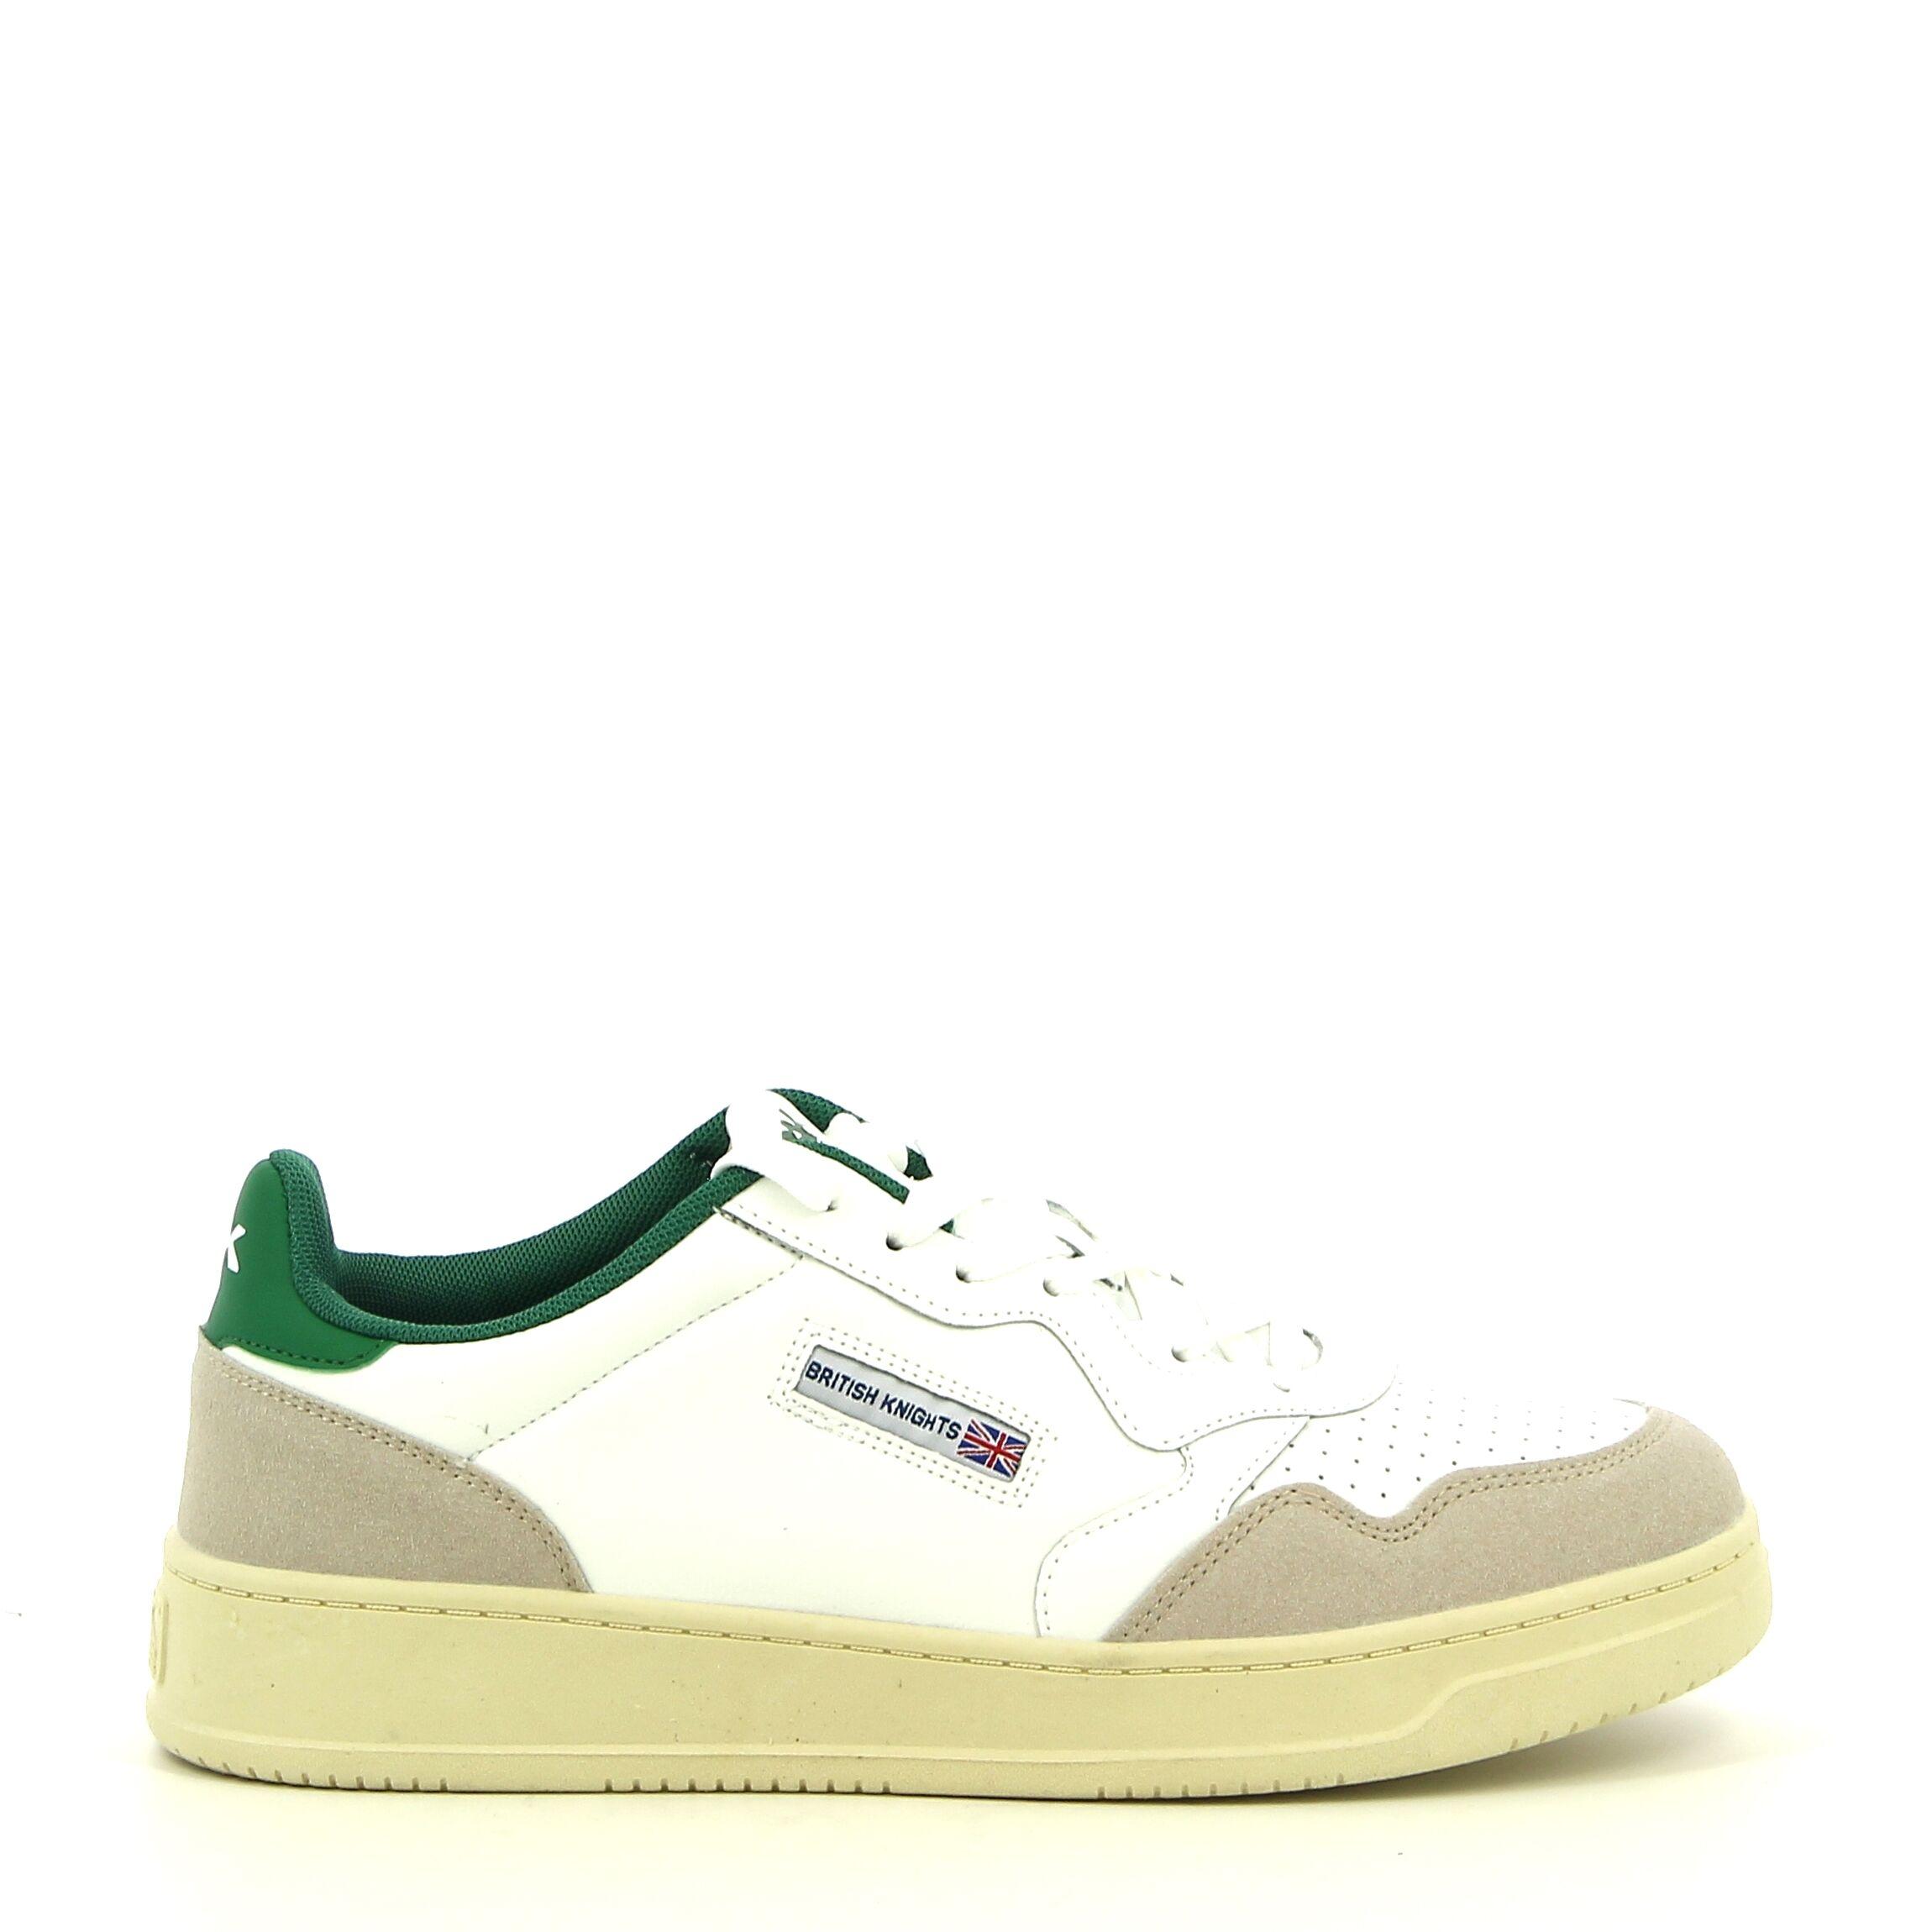 BK - Wit/Groen - Sneakers